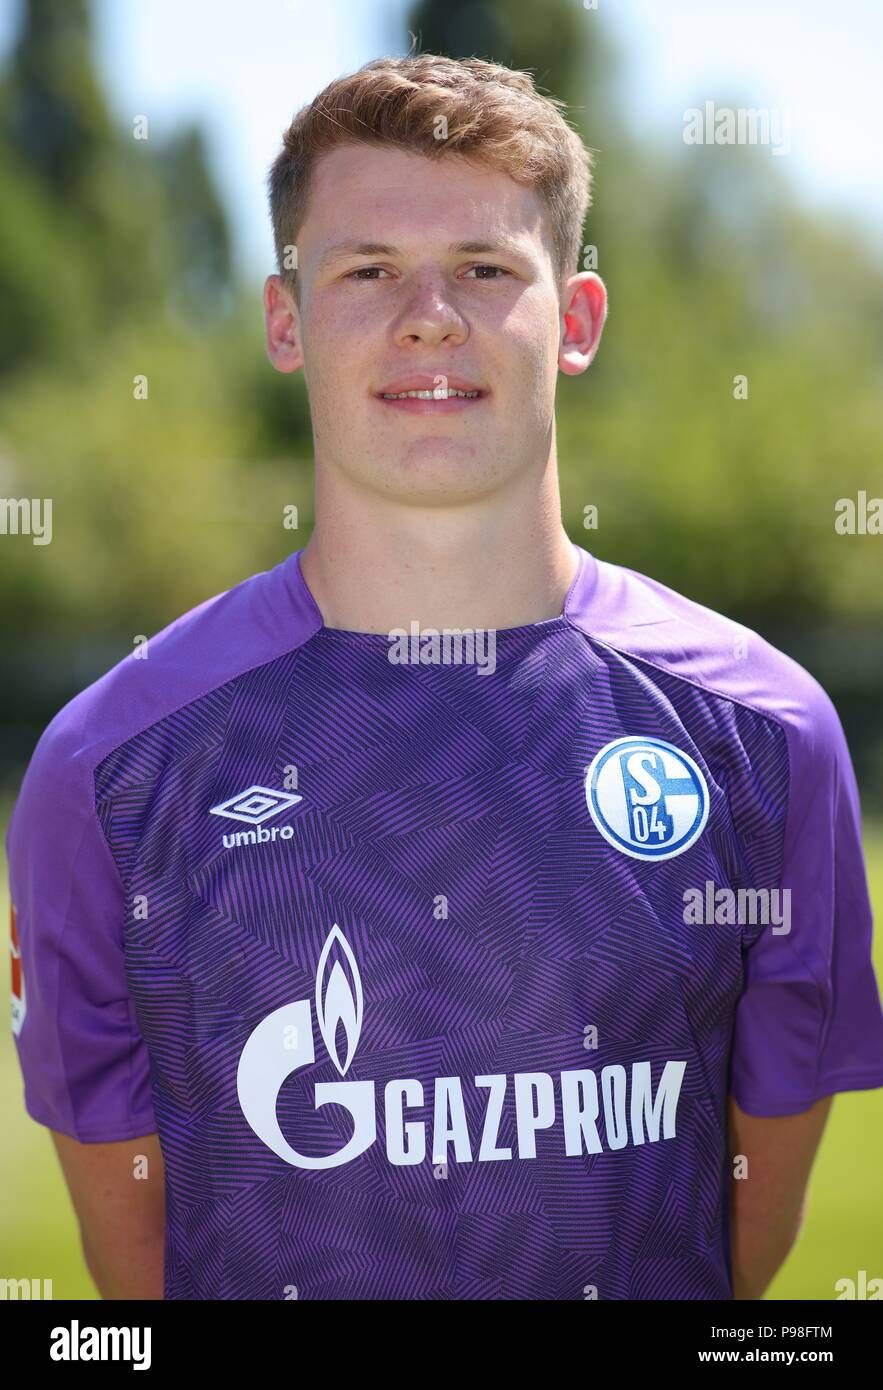 Camiseta FC Schalke 04 Alexander Nübel